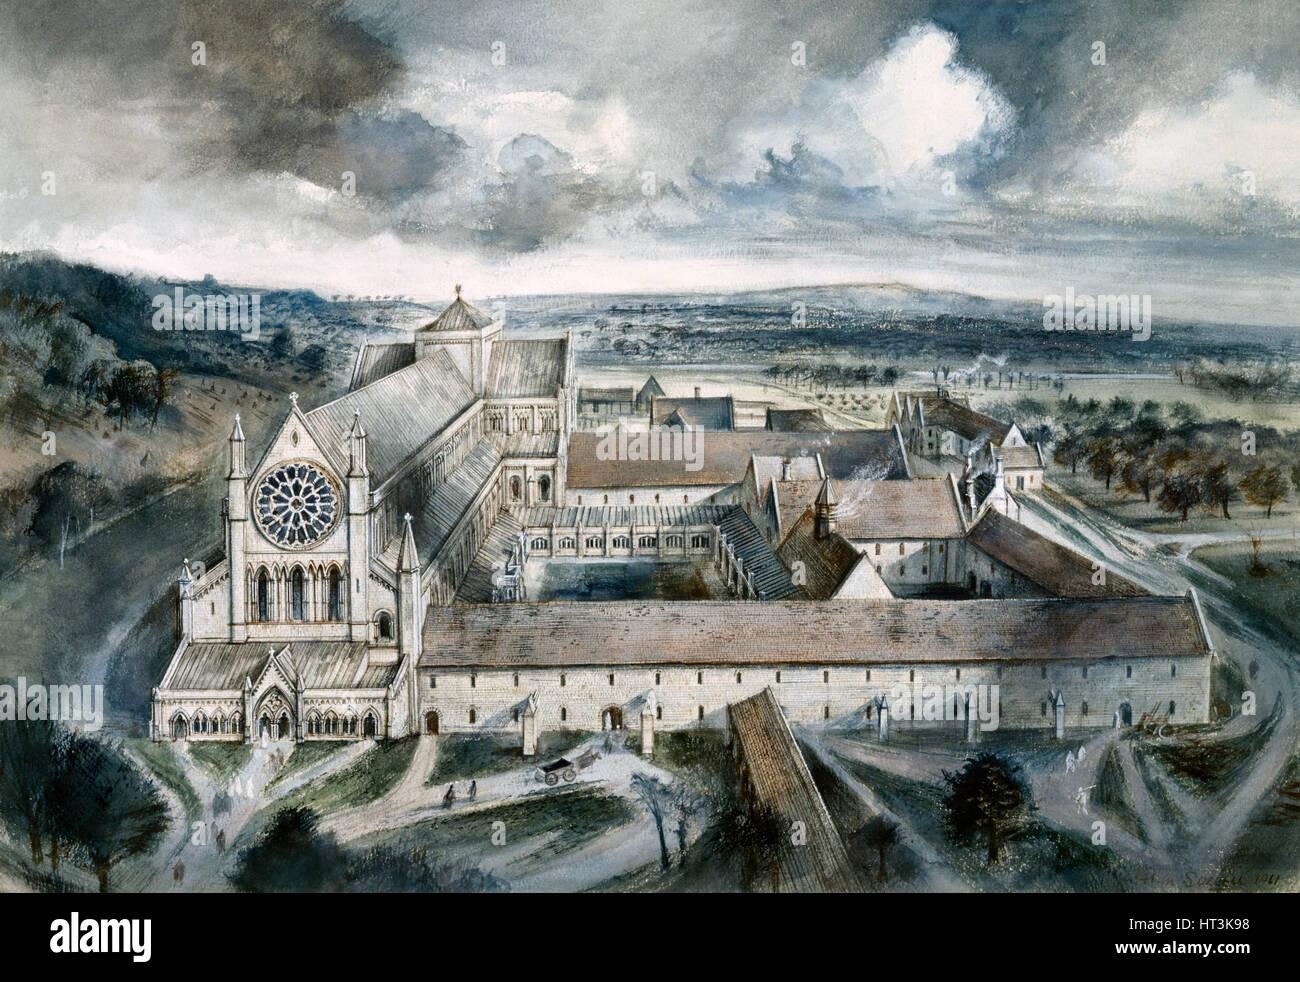 Byland Abbey, 1539, (c1960s). Artist: Alan Ernest Sorrell. - Stock Image